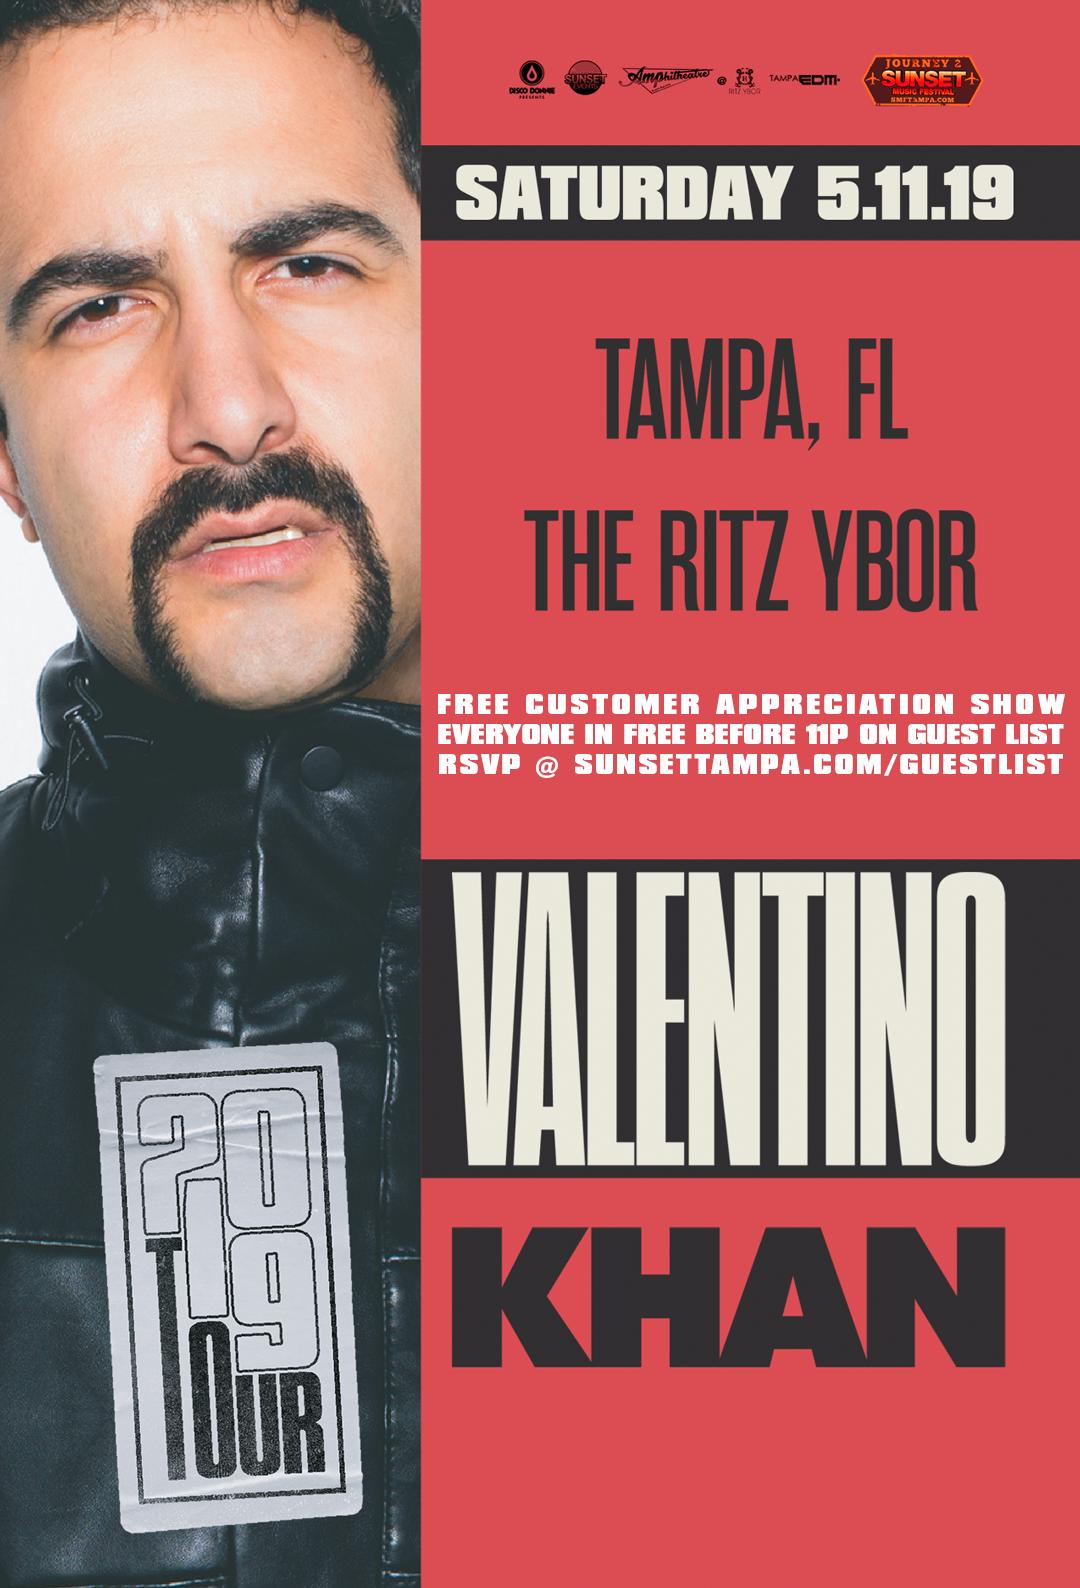 Valentino Khan – 2019 Tour – Journey 2 Sunset Music Festival – Sunset Saturdays at The RITZ Ybor – 5/11/2019